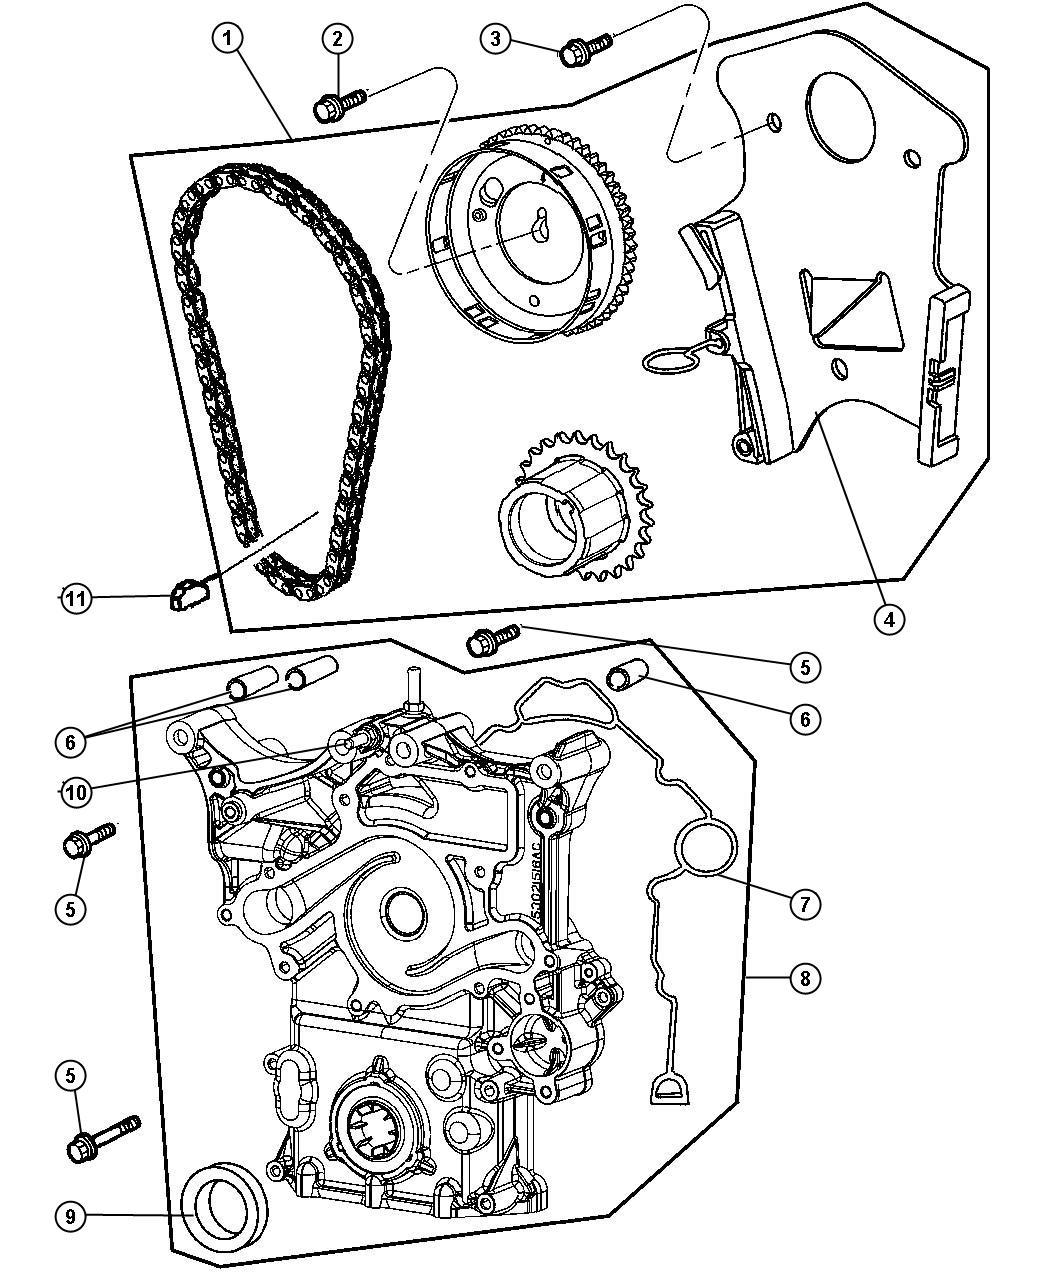 Dodge Durango Timing Drive Kit Engine Mega Cab Quad Cab